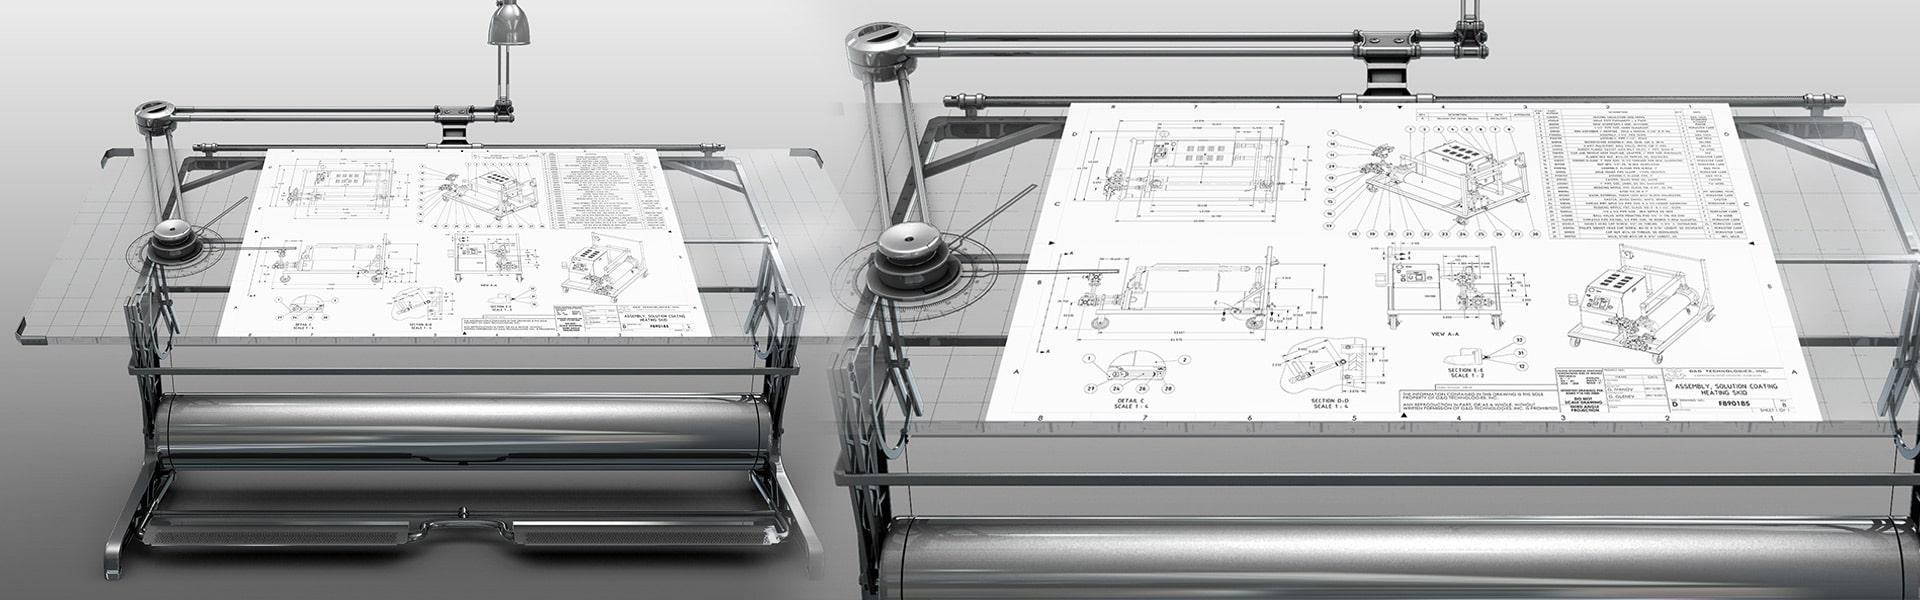 Design, modeling and engeneering